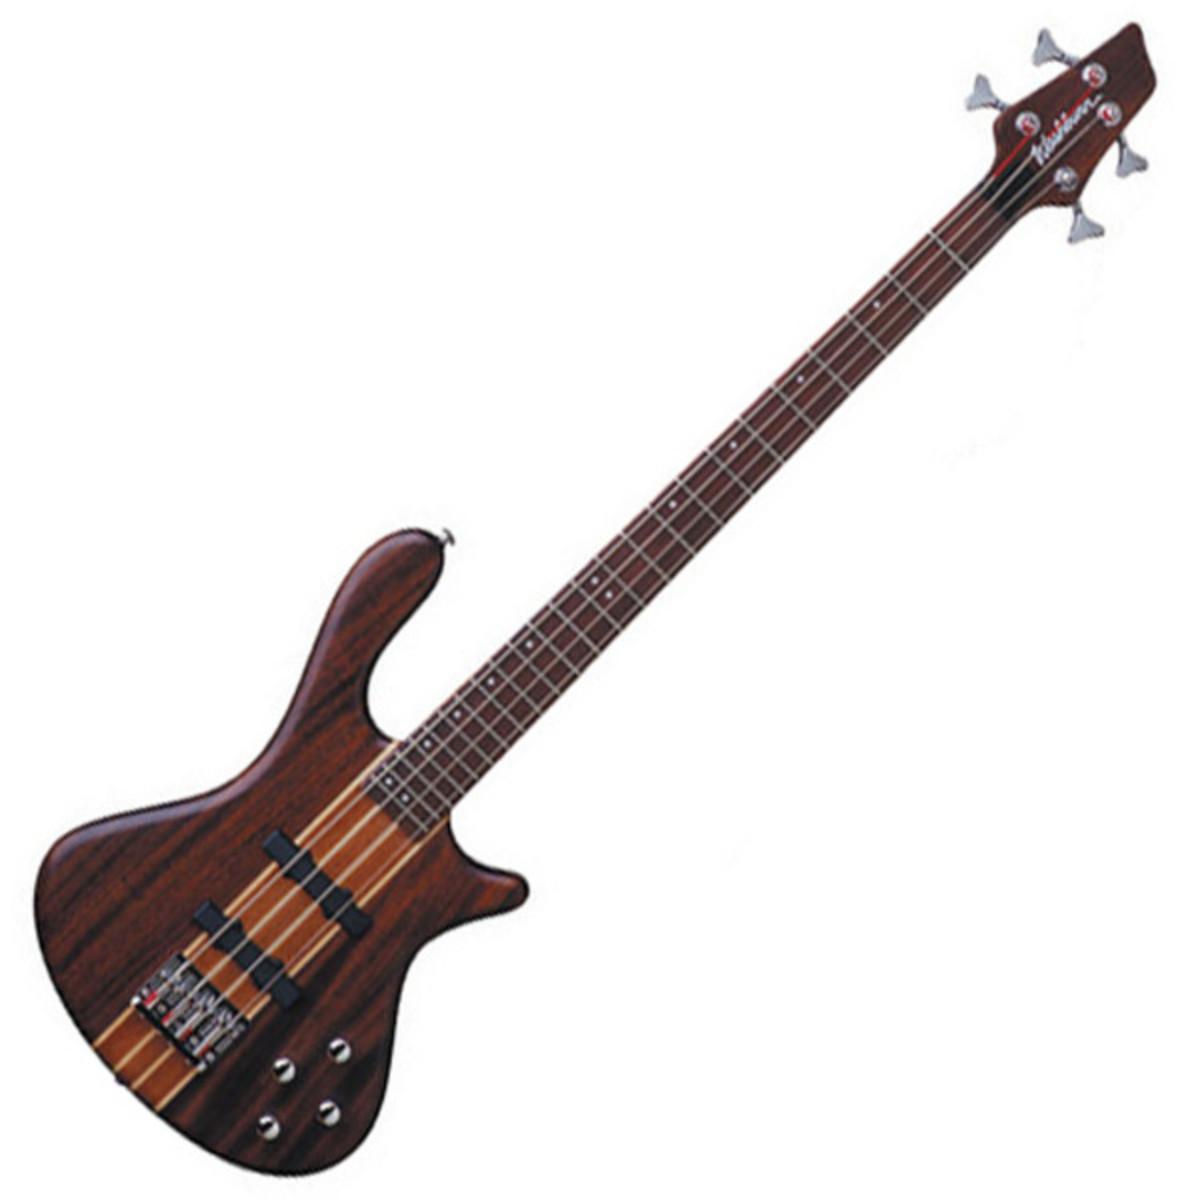 washburn taurus t24 bass guitar natural mahogany at gear4music. Black Bedroom Furniture Sets. Home Design Ideas